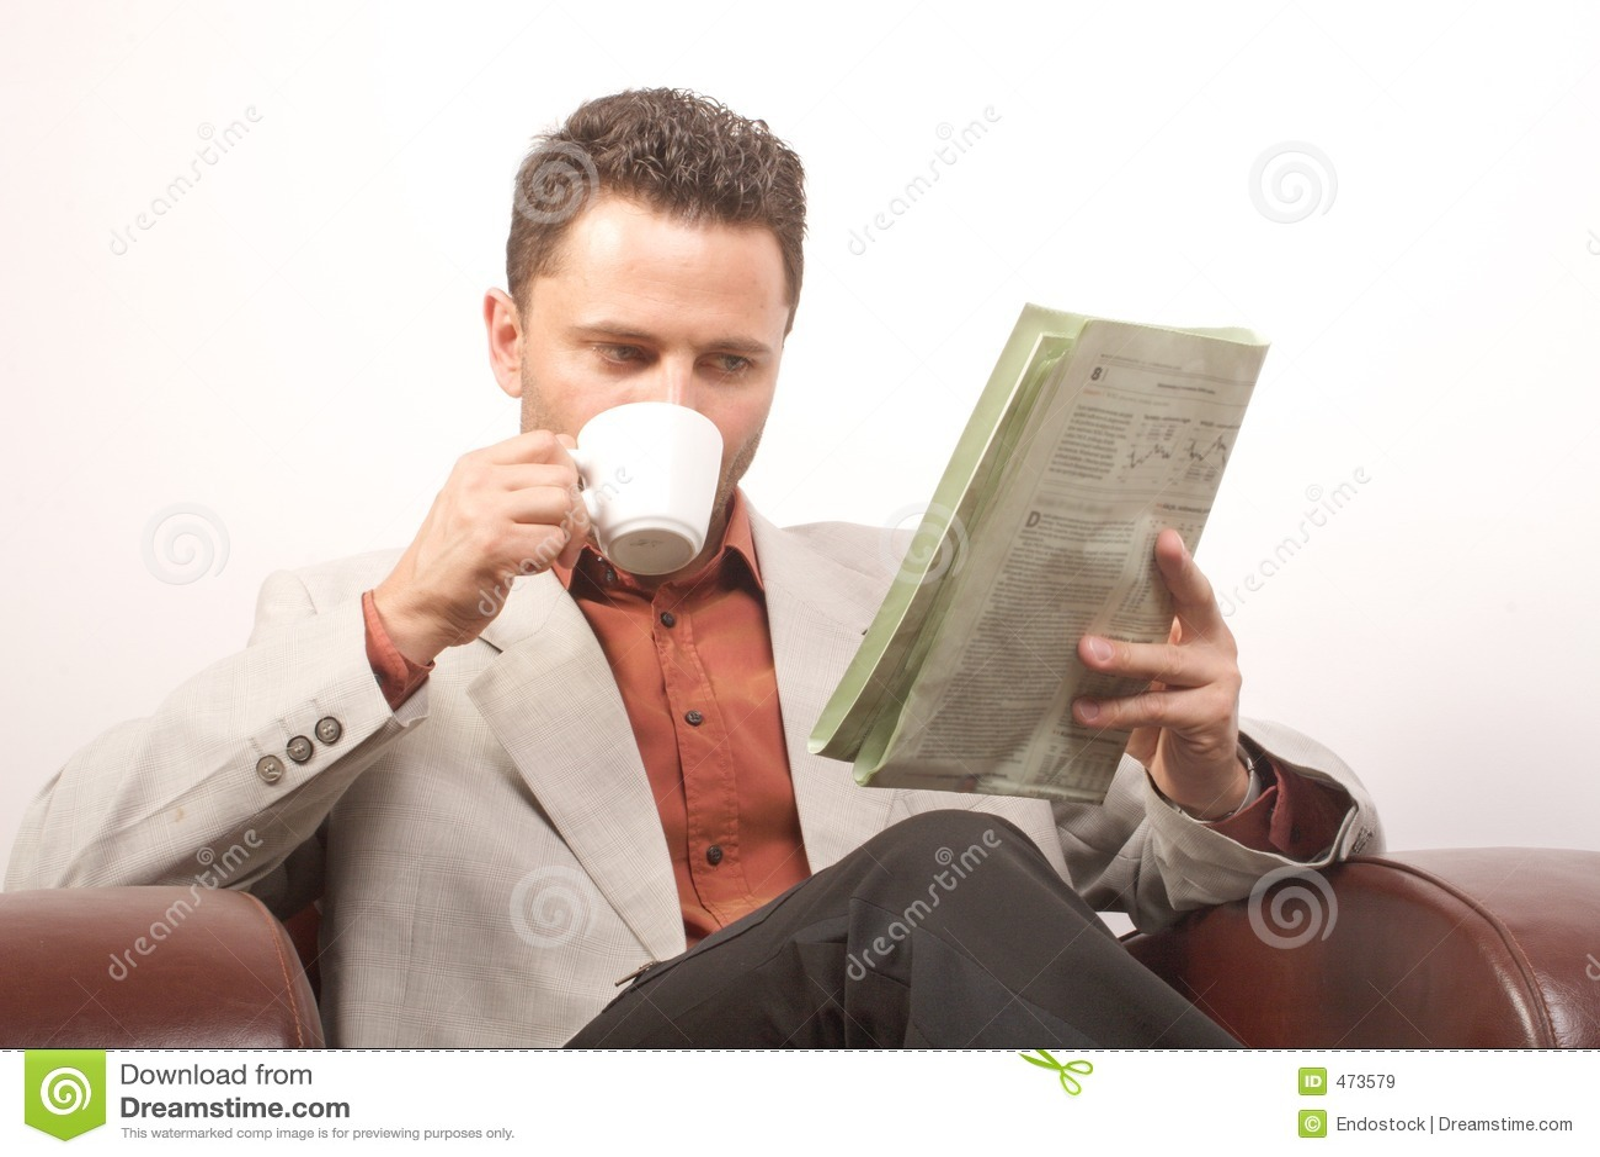 Man drinking coffee,reading newspaper